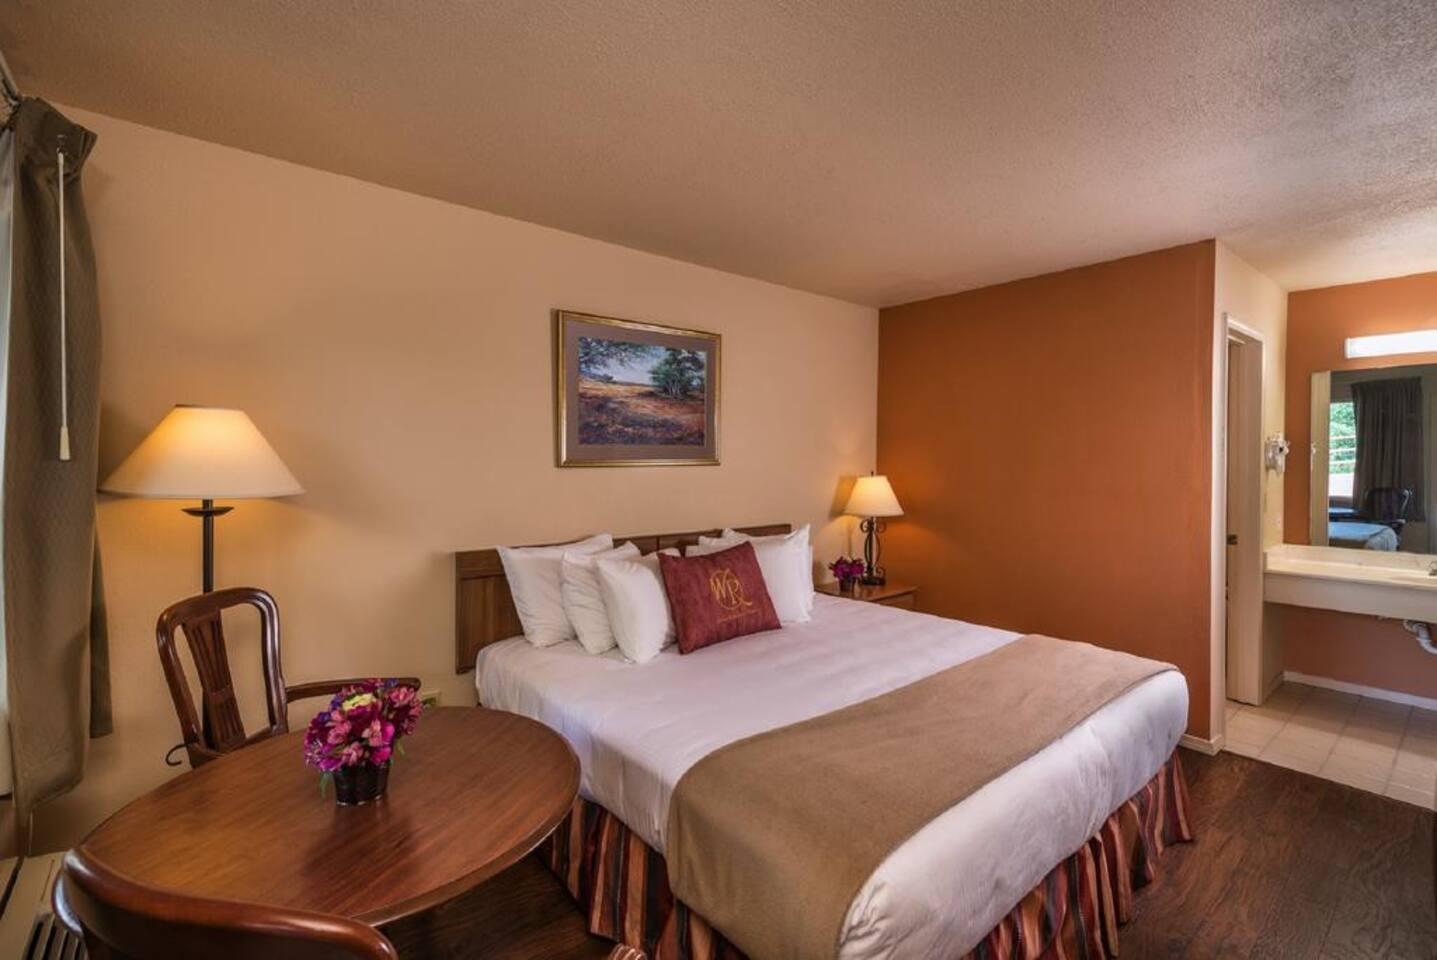 SPECIAL!!! Luxury 1 Bedroom in Branson #Woods photo 15816991